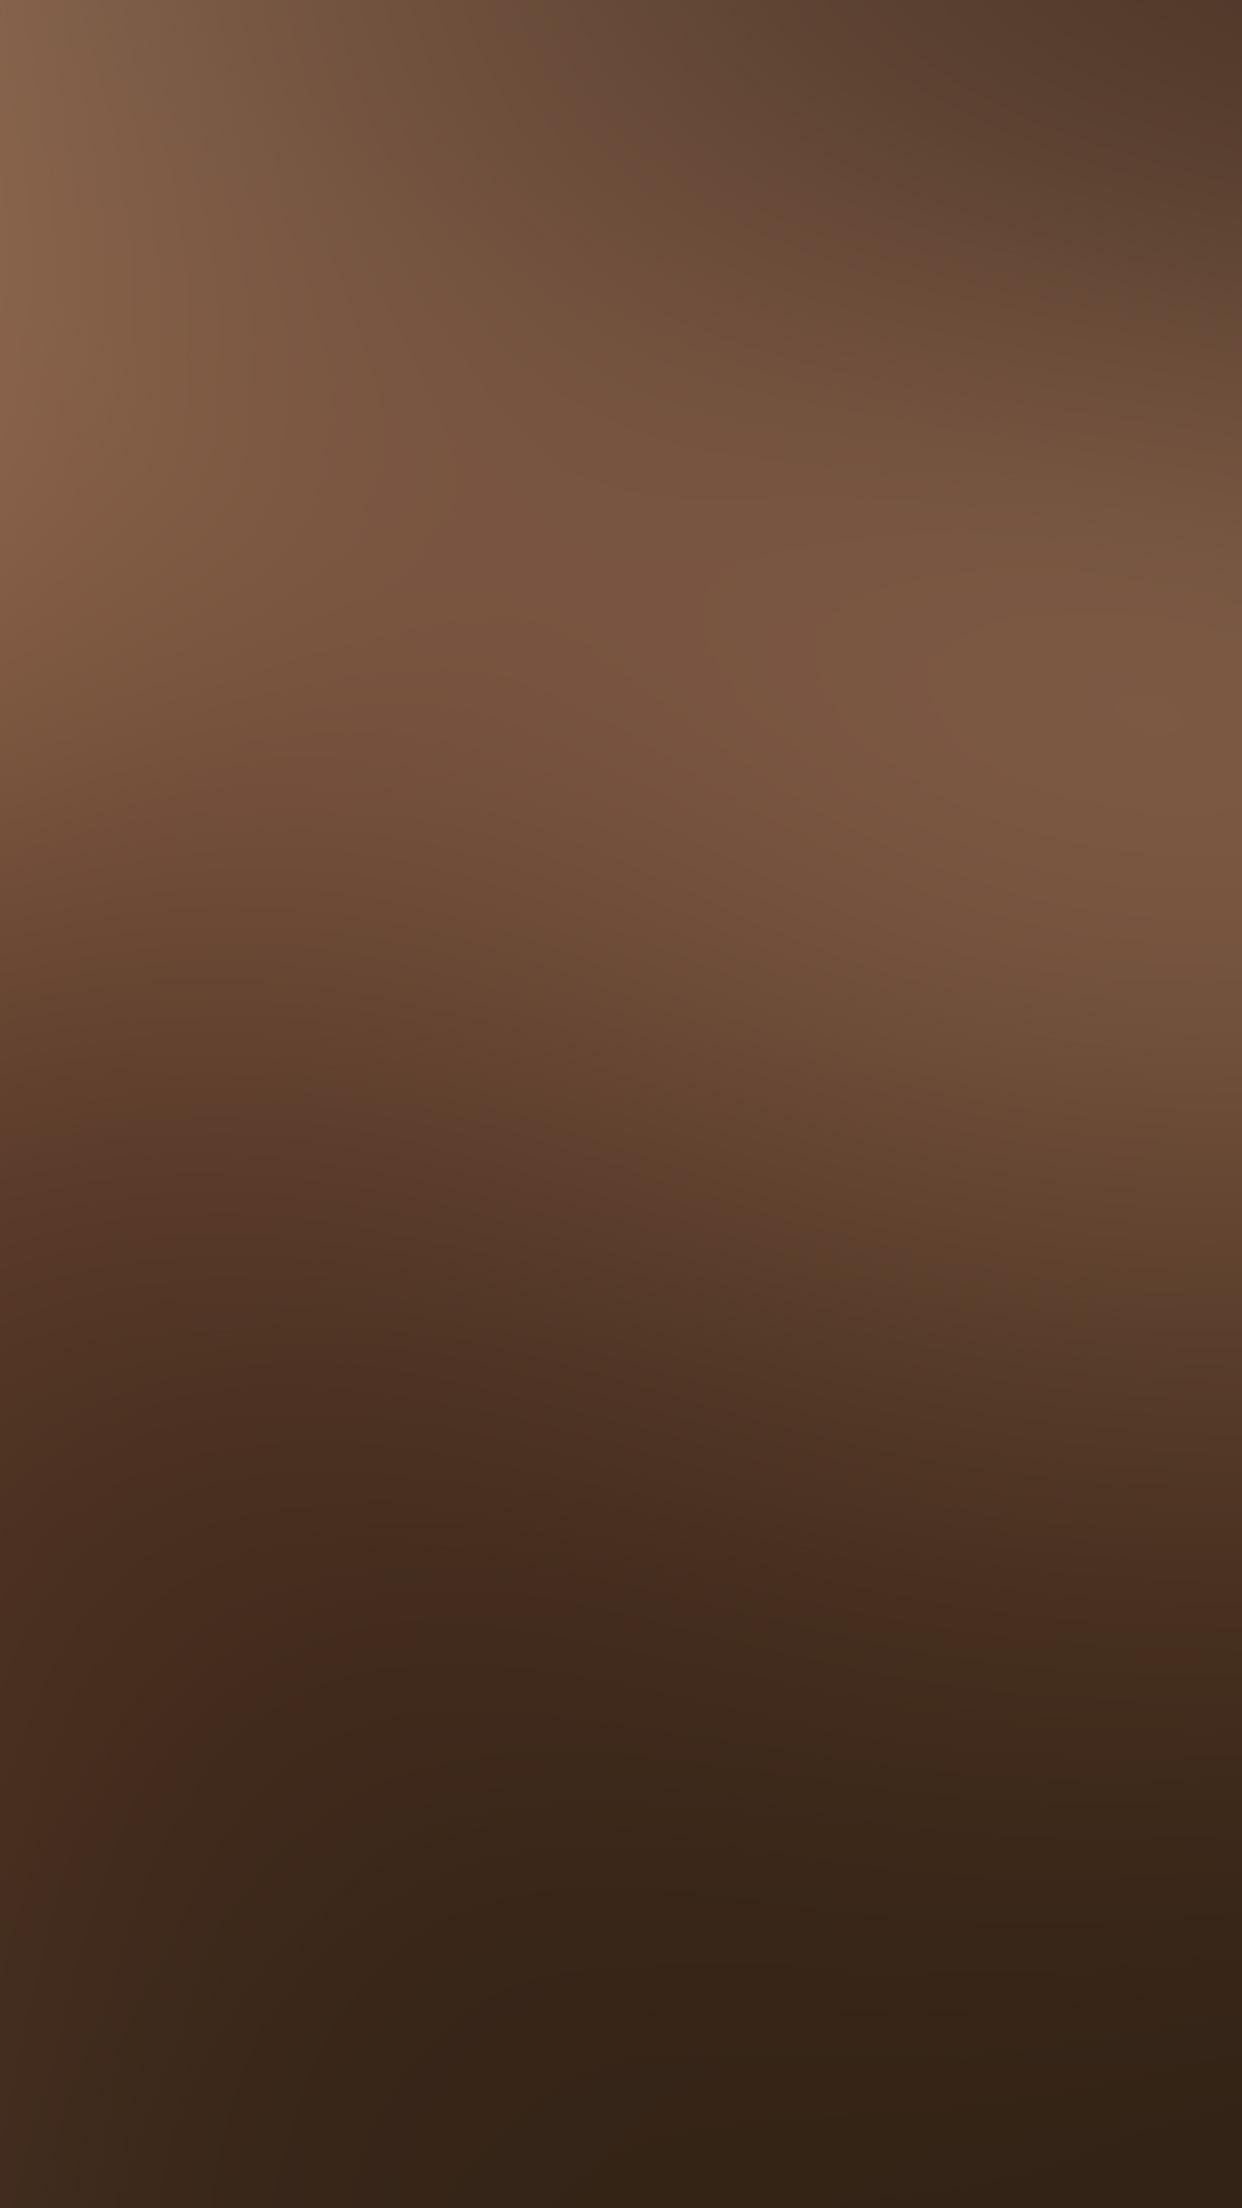 Best Iphone 6 Plus Wallpaper Papers Co Iphone Wallpaper Si13 Dark Skin Brown